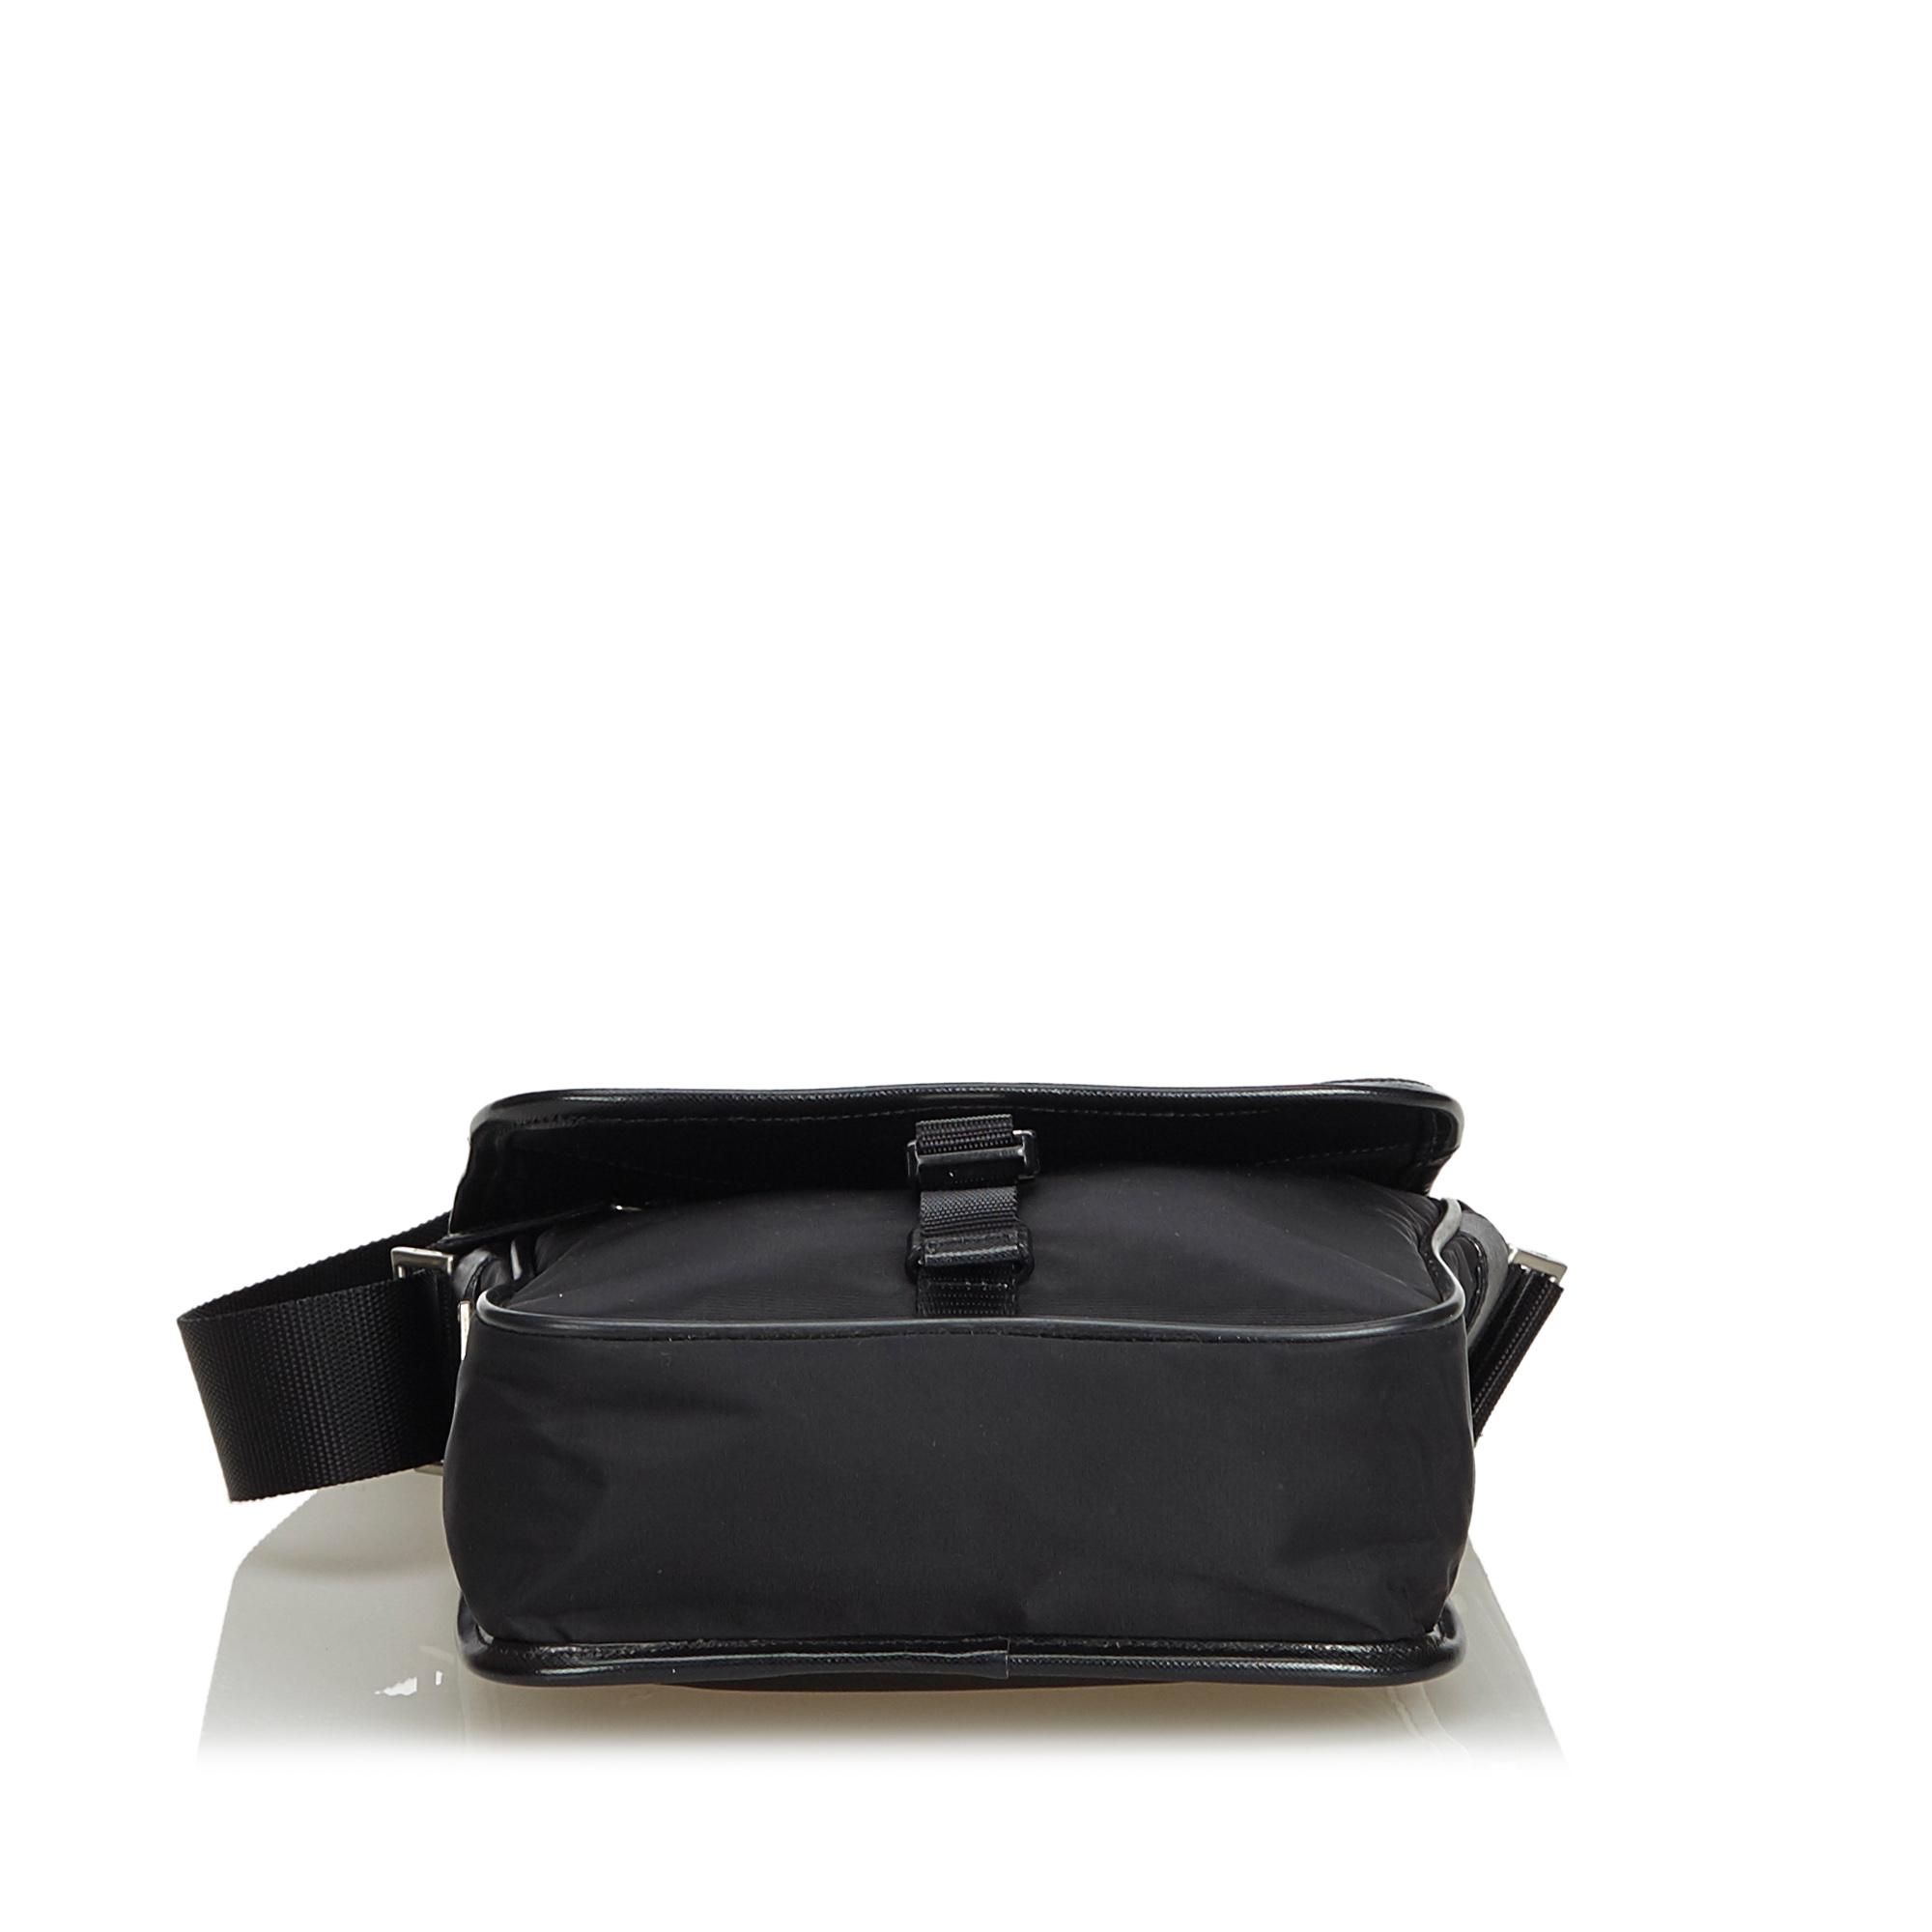 d10b06455f Vintage Prada Black Nylon Fabric Crossbody Bag Italy 4 4 of 12 ...